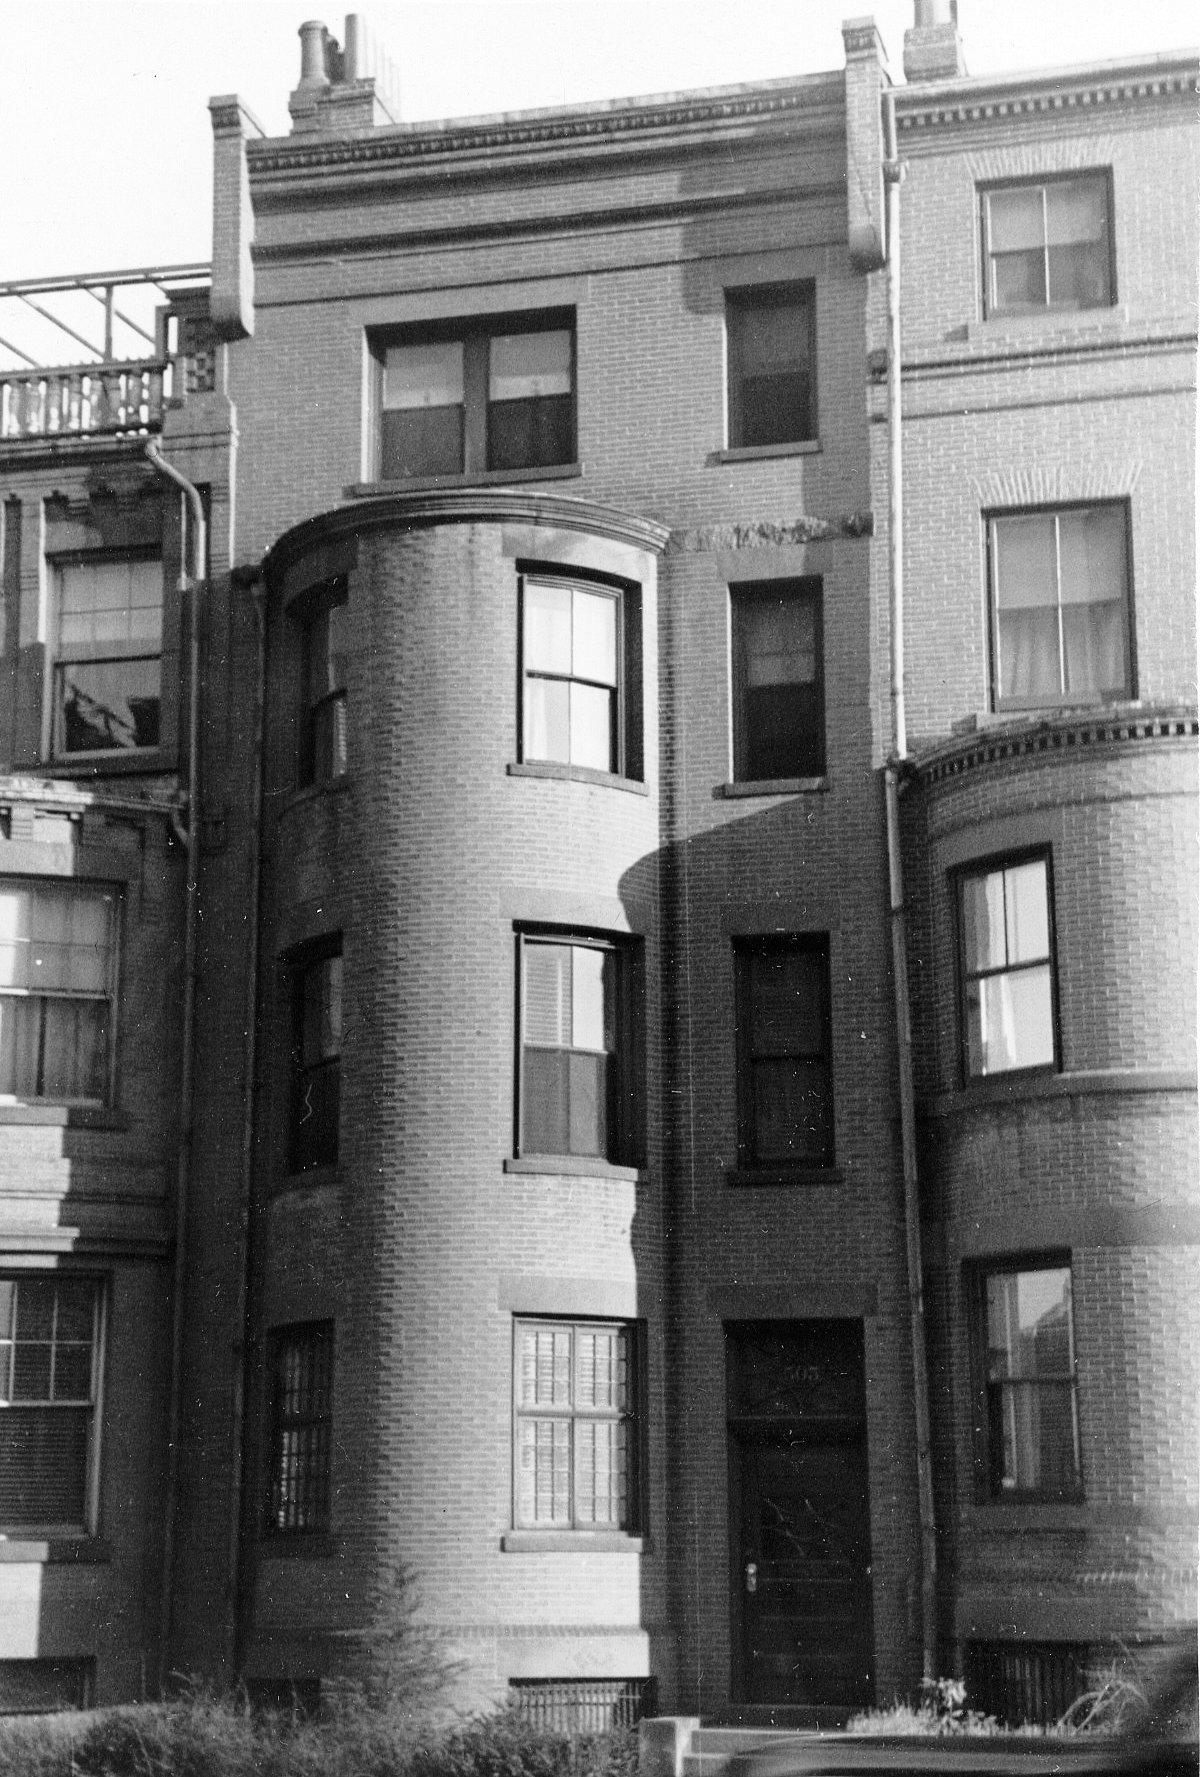 503 Beacon (ca. 1942), Photograph By Bainbridge Bunting, Courtesy Of The